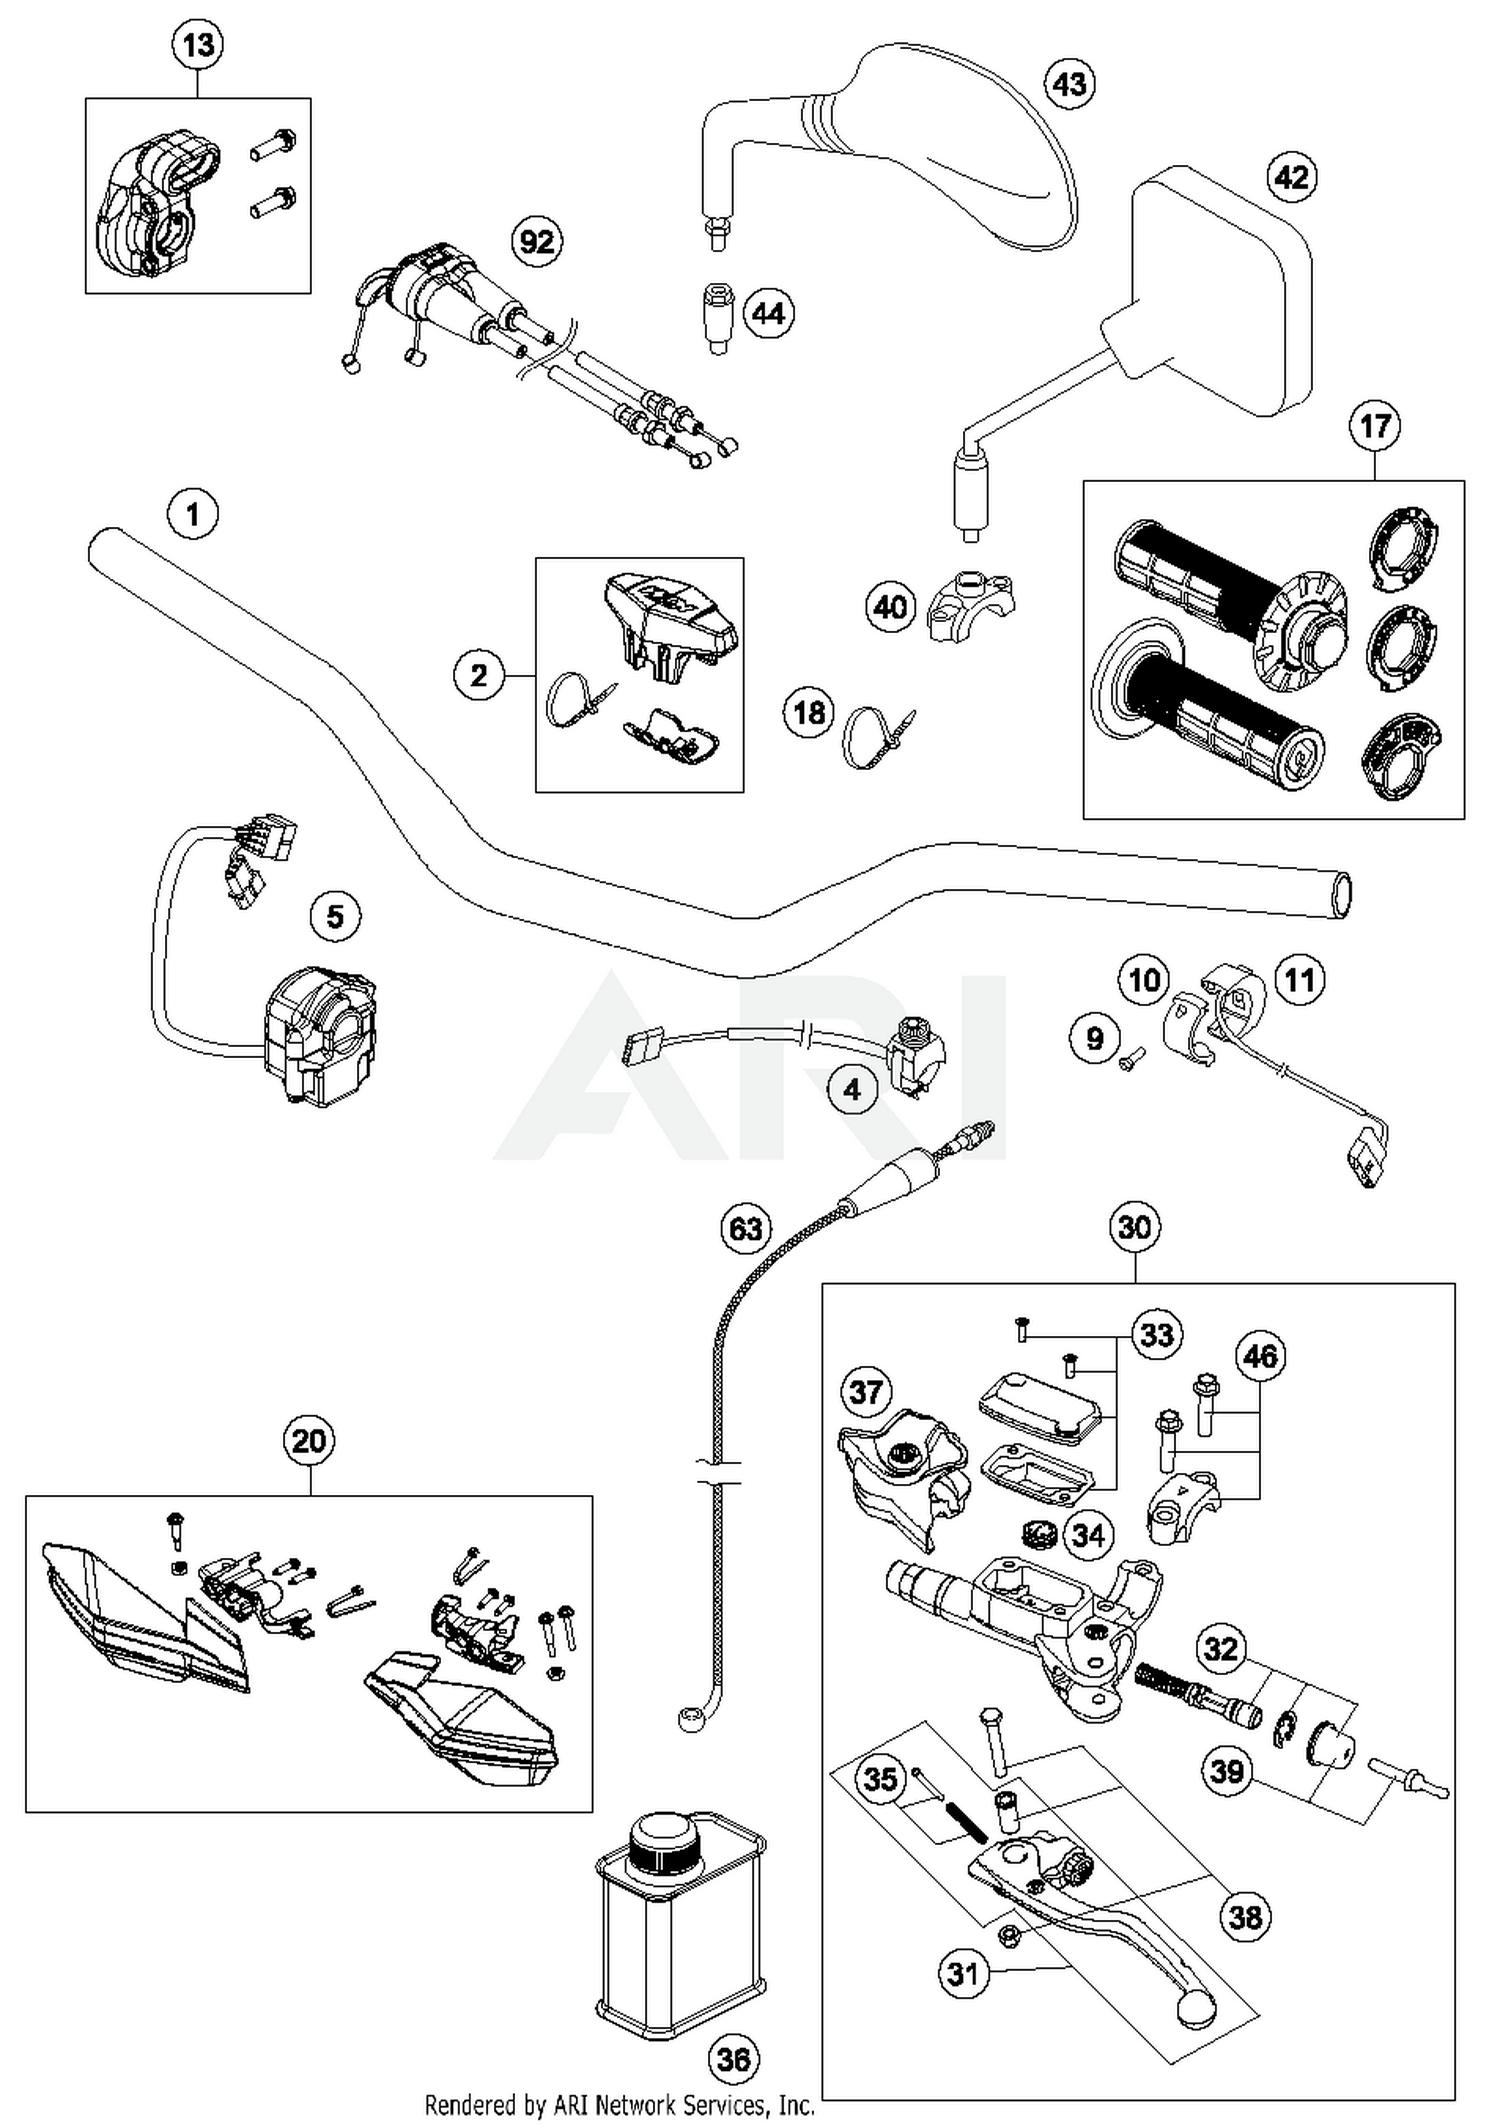 2017 Ktm 350 Exc F Handlebar Controls Parts Best Oem Engine Diagram For Motorcycles